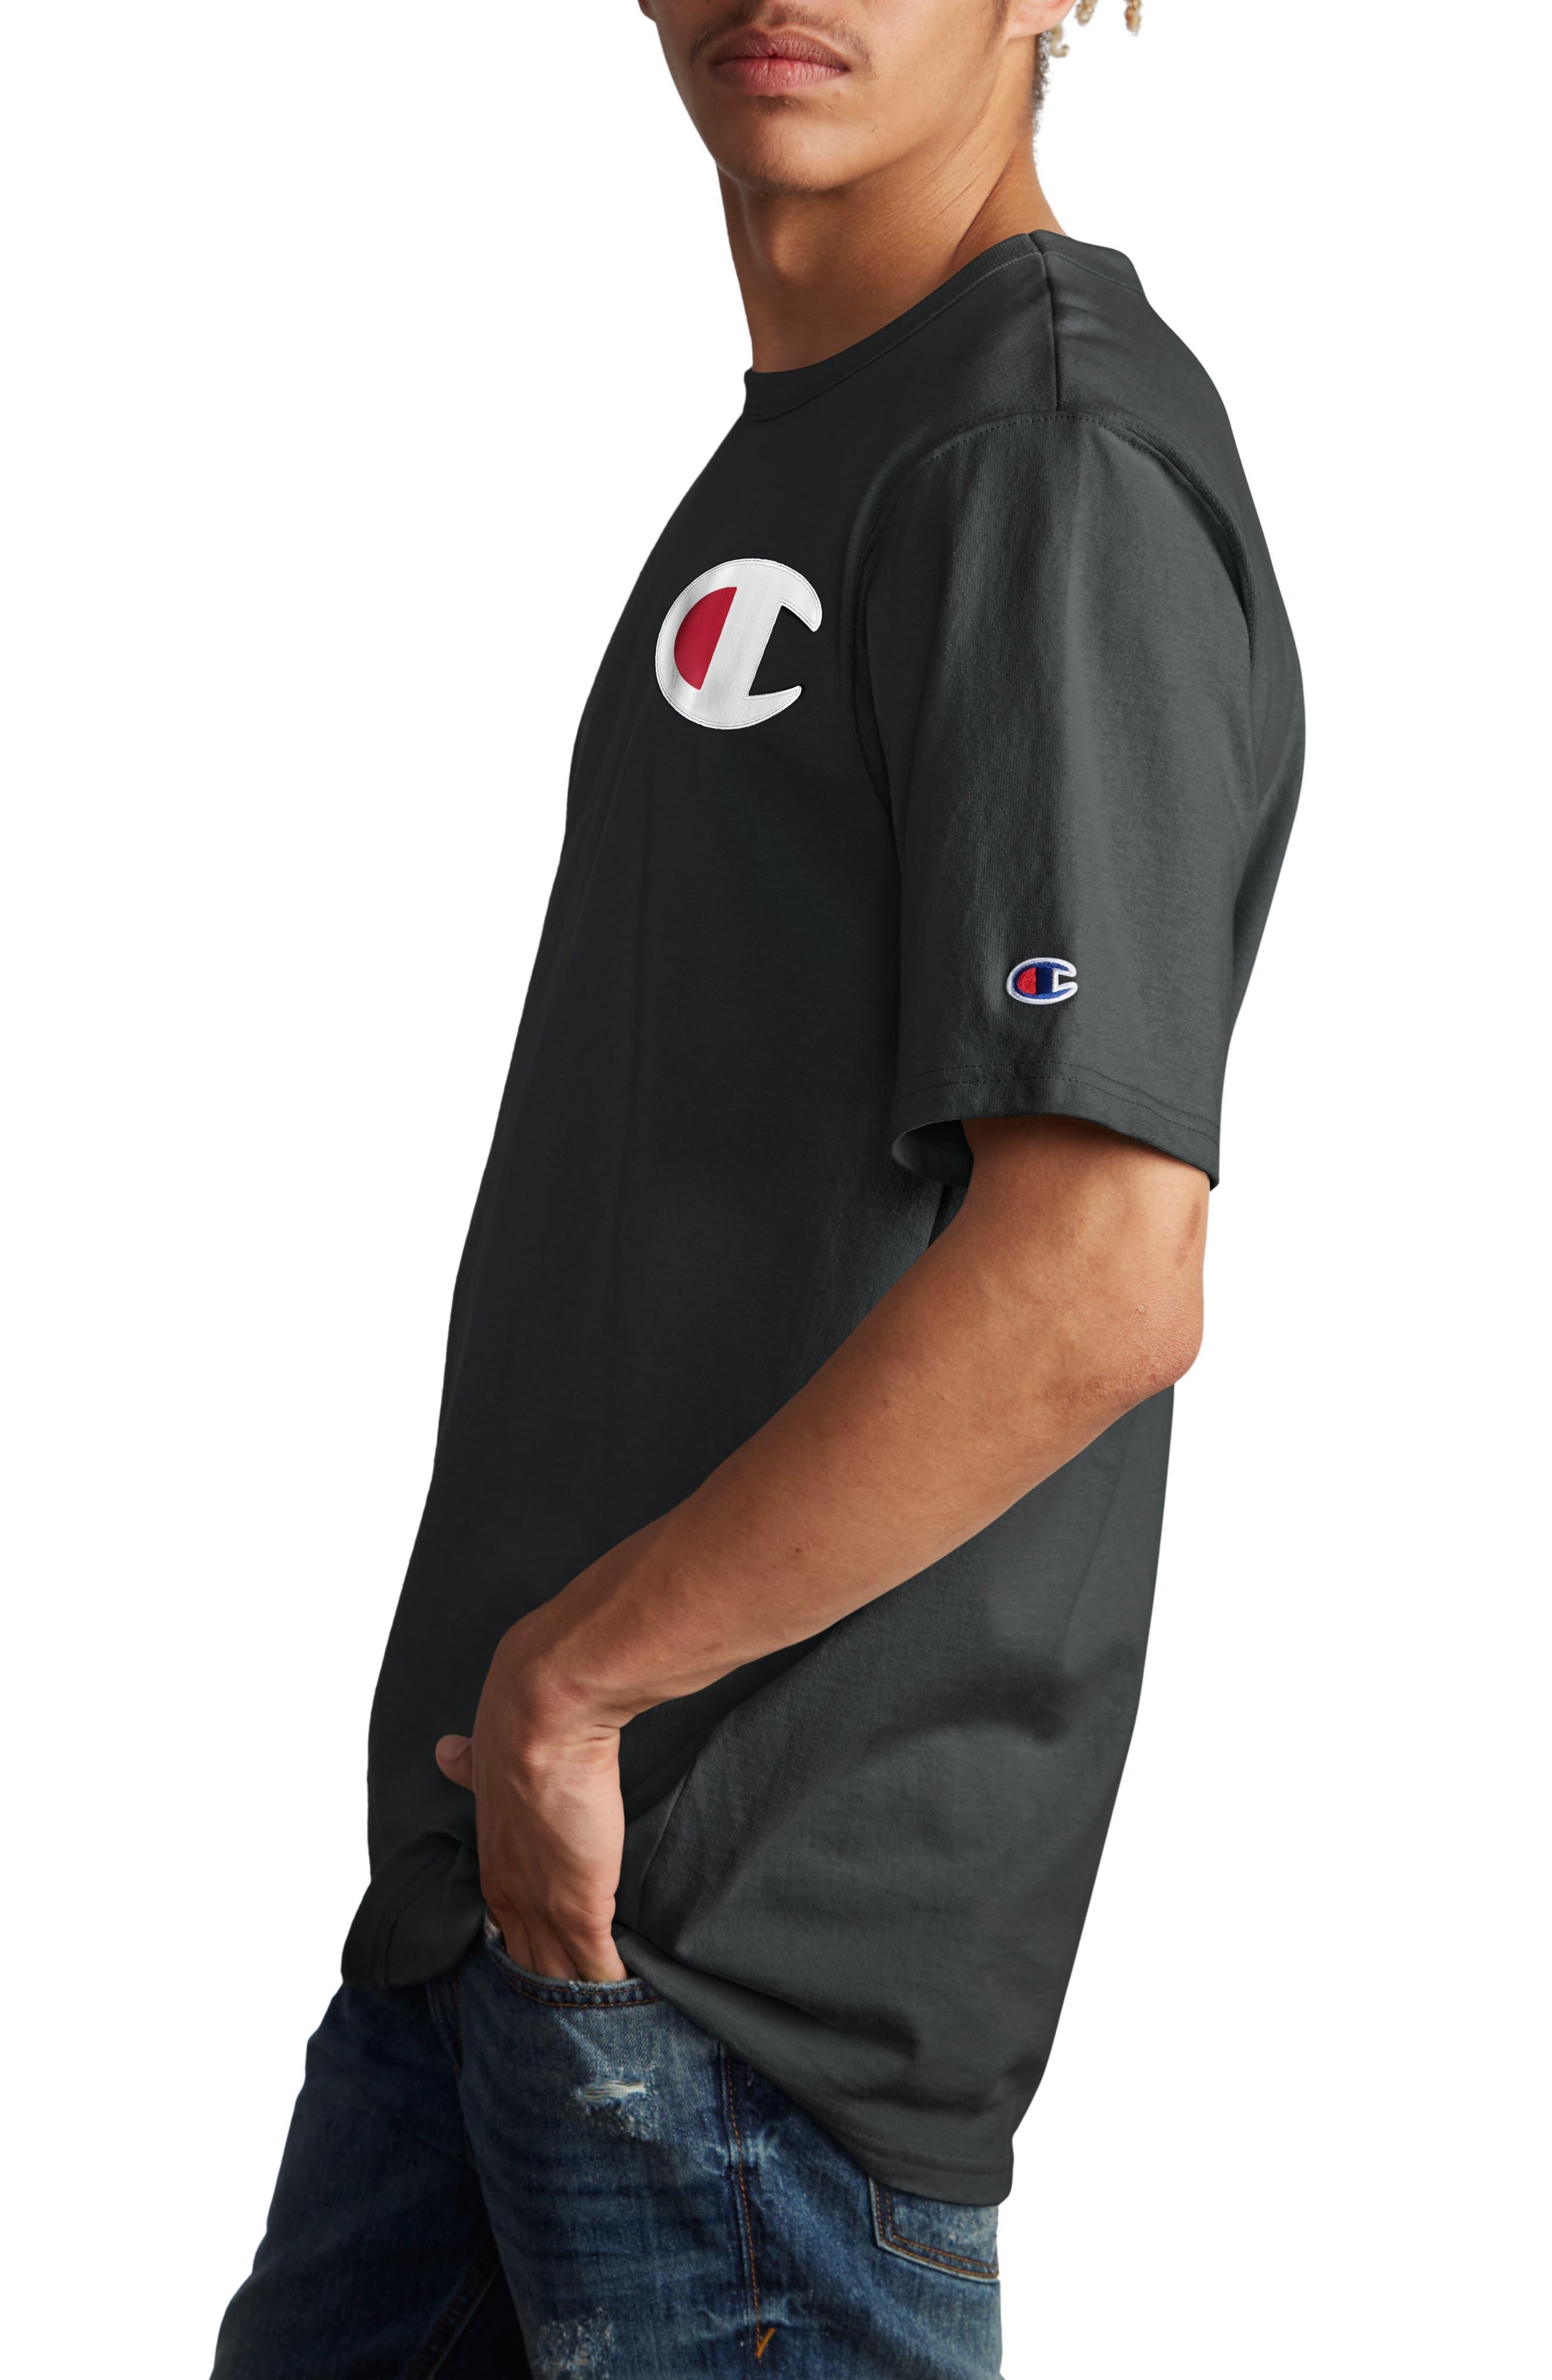 CHAMPION, Elevated C-Patch T-Shirt, Alternate thumbnail 3, color, BLACK